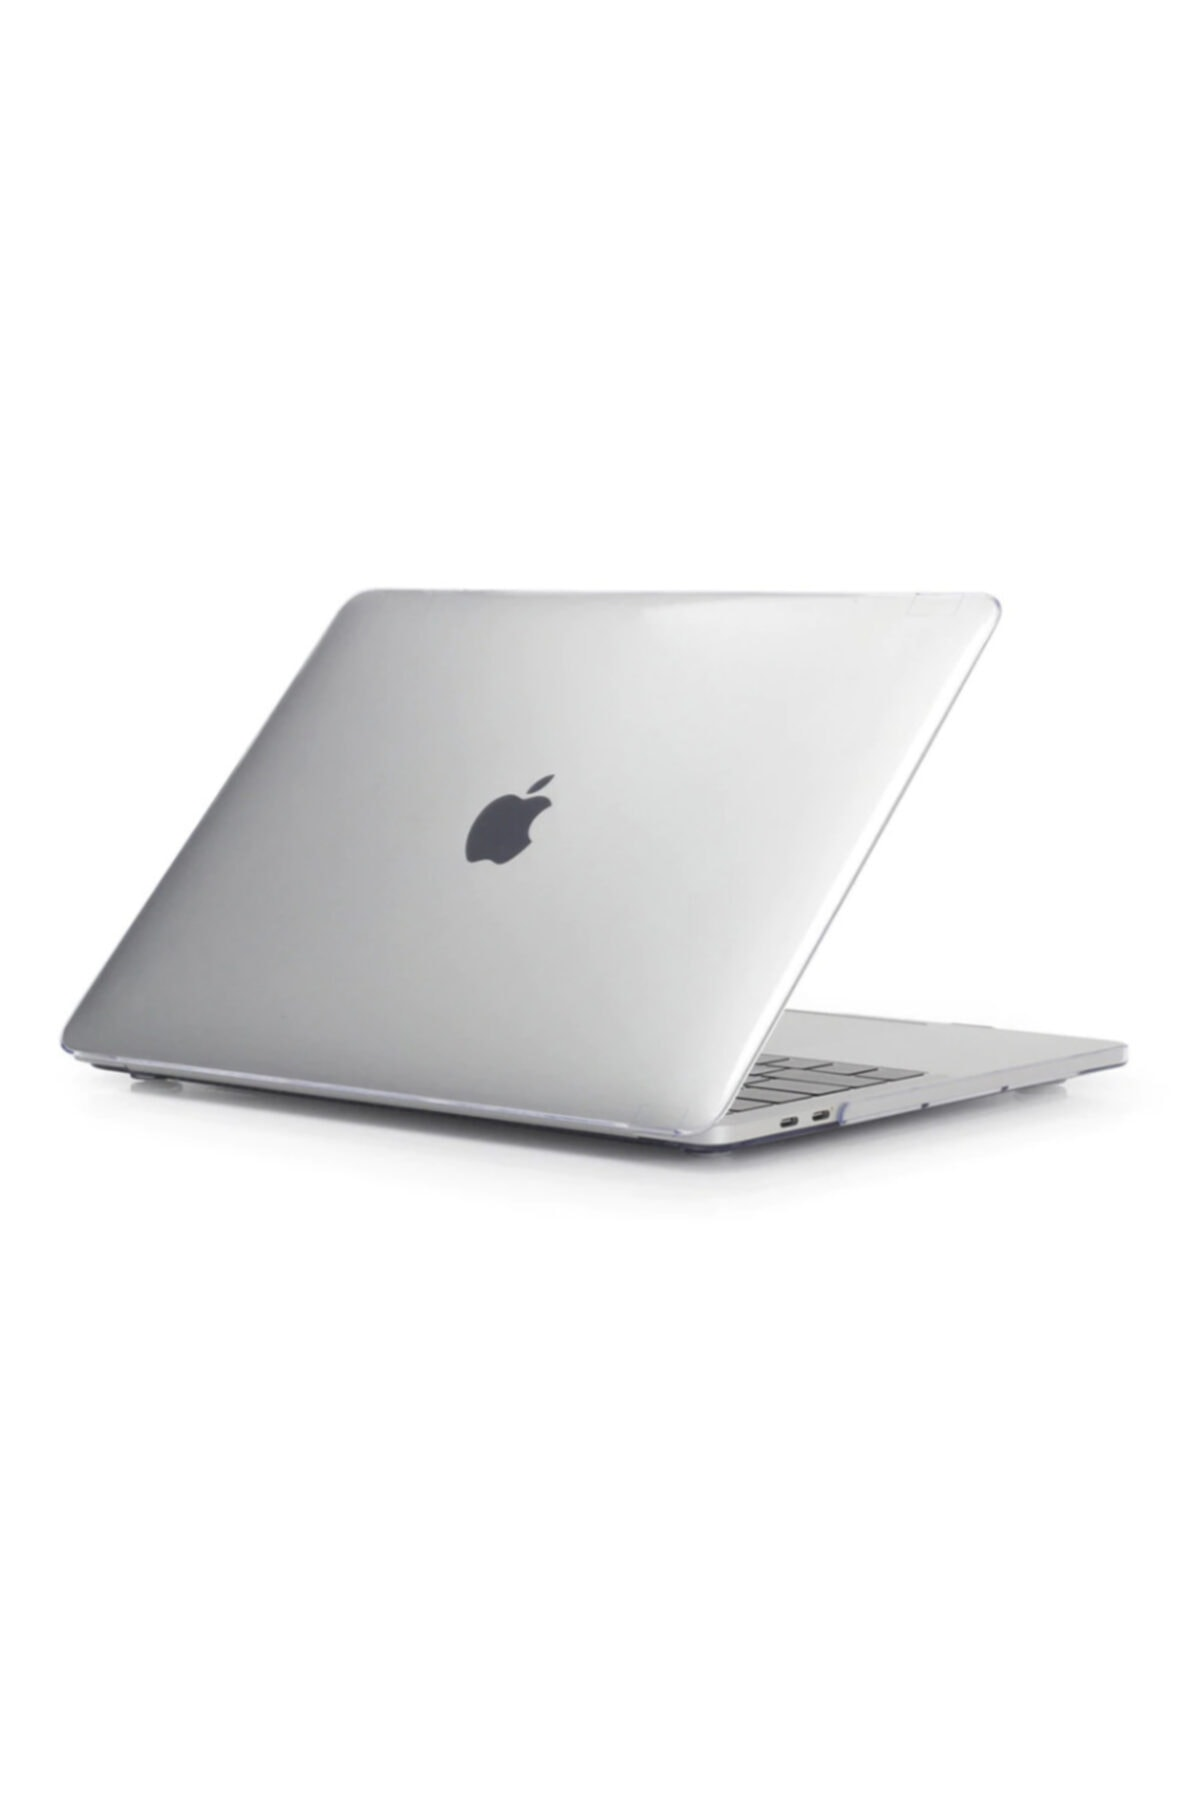 Apple Macbook Pro 2020 A2338 Beyaz 13 Inç Touch Bar Sert Kapak Koruma Kılıf